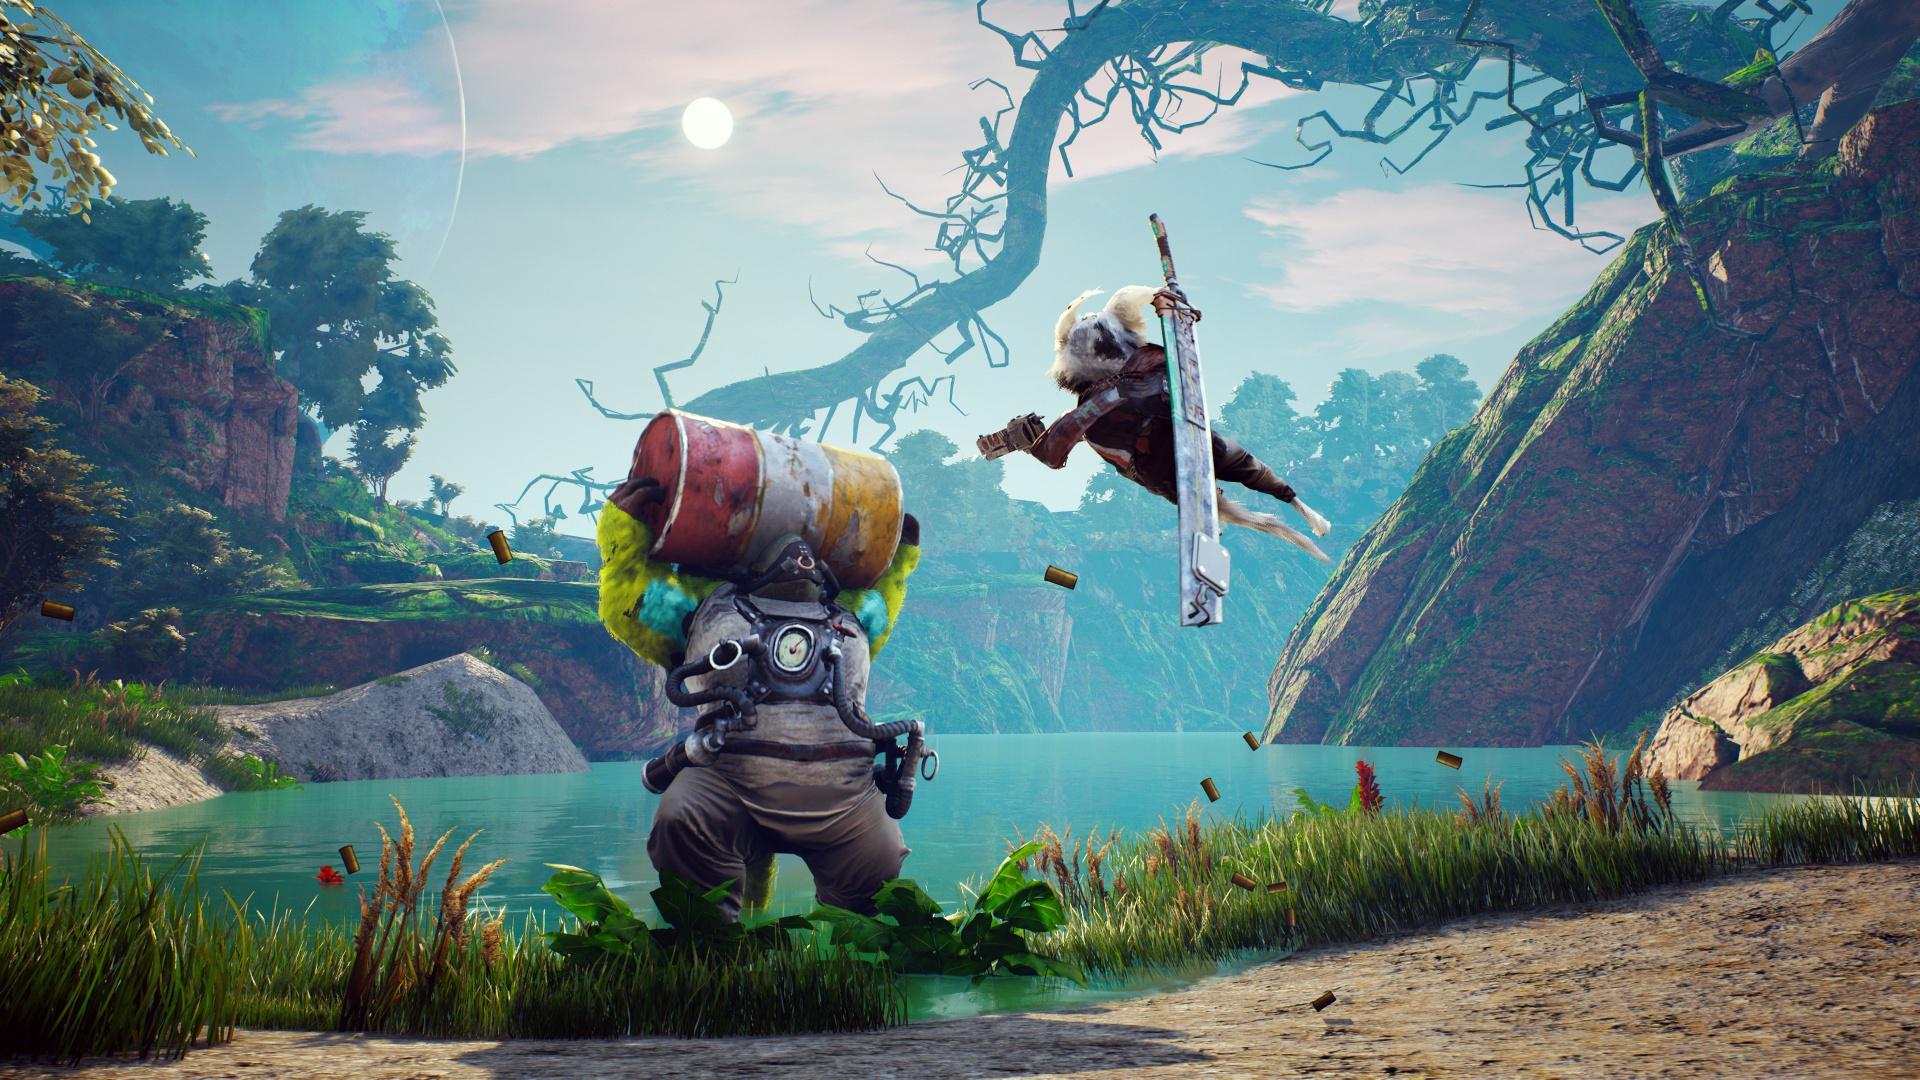 Biomutant release date set for after March 2021 | GamesRadar+